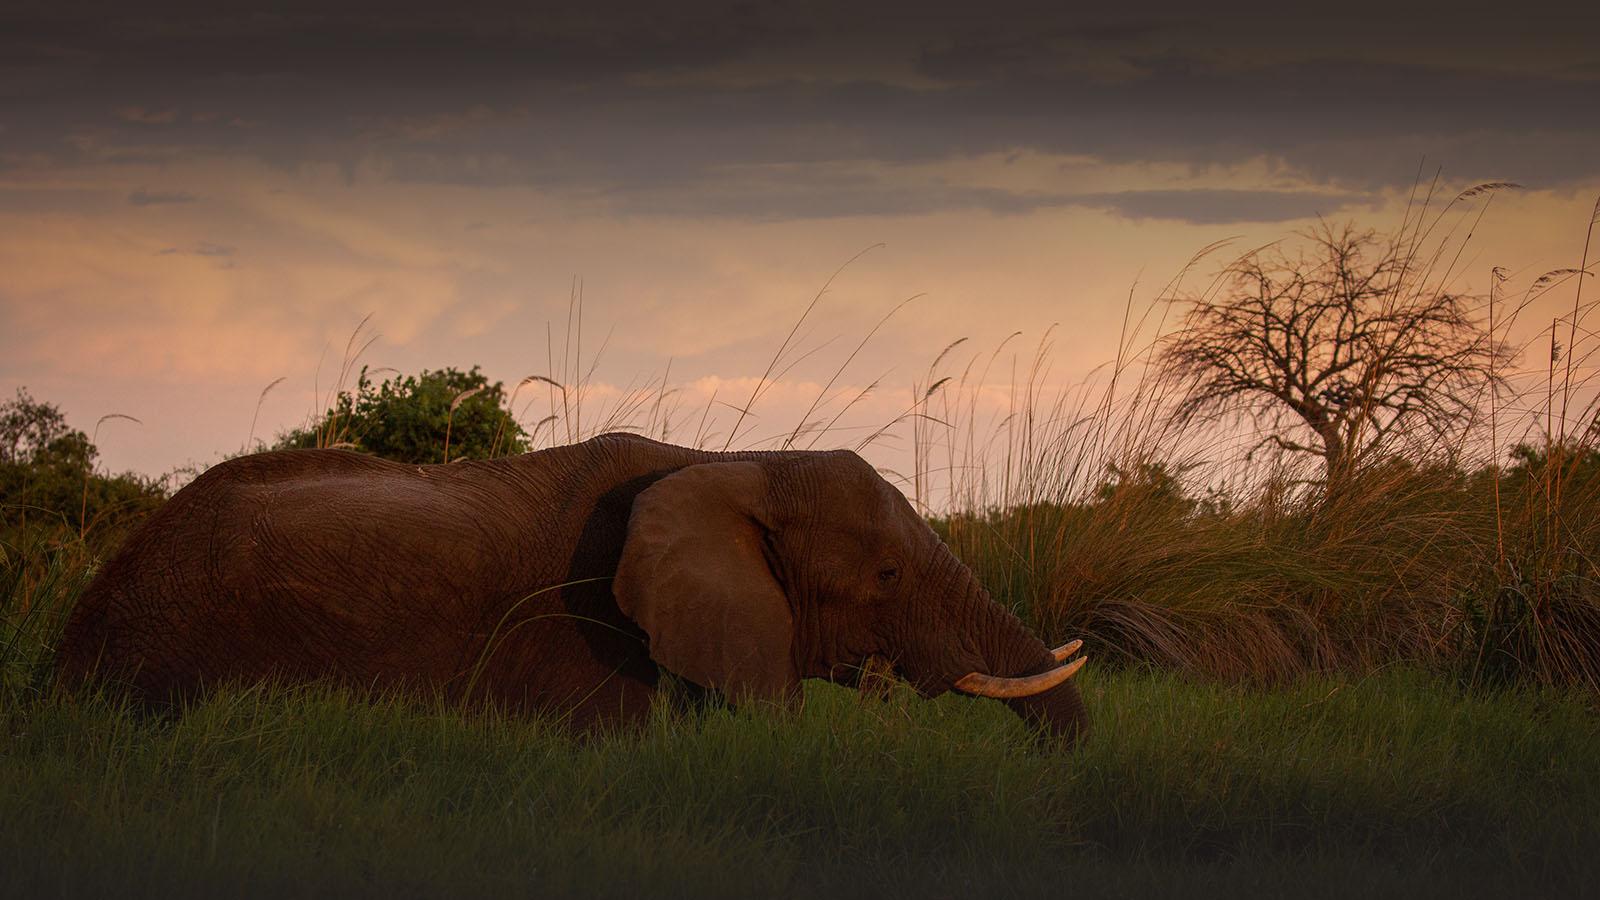 great plains duba plains camp duba-plains-suite-okavango-delta-botswana-lodges-zambia-in-style-luxury-wildlife-elephant